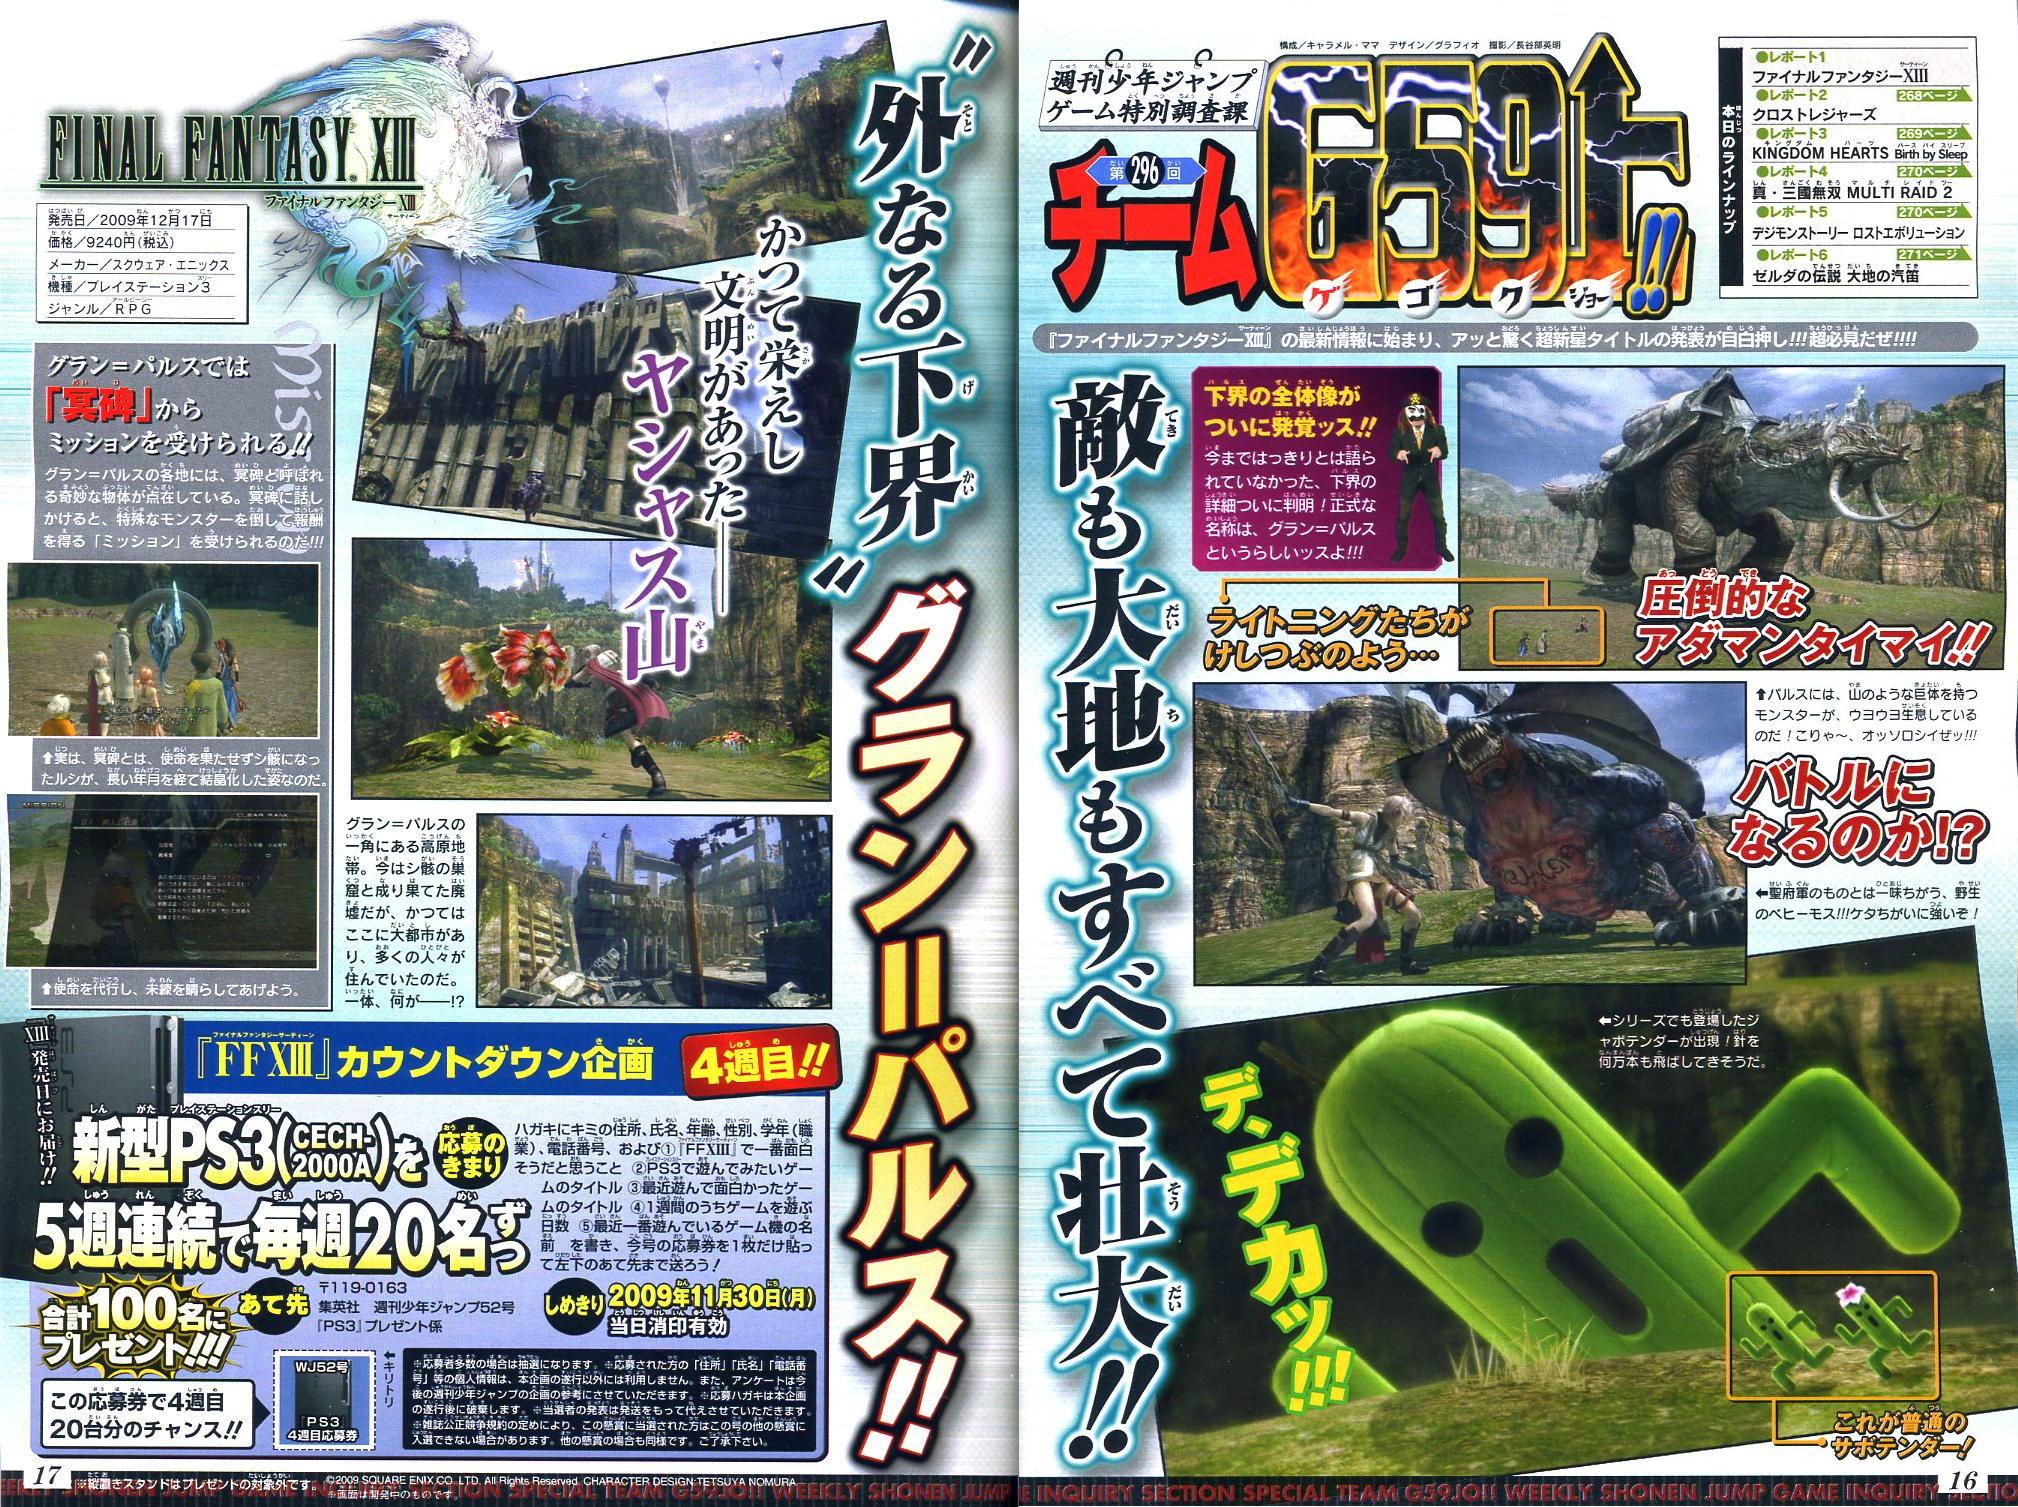 FFXIII PS3 scan-ShonenJump